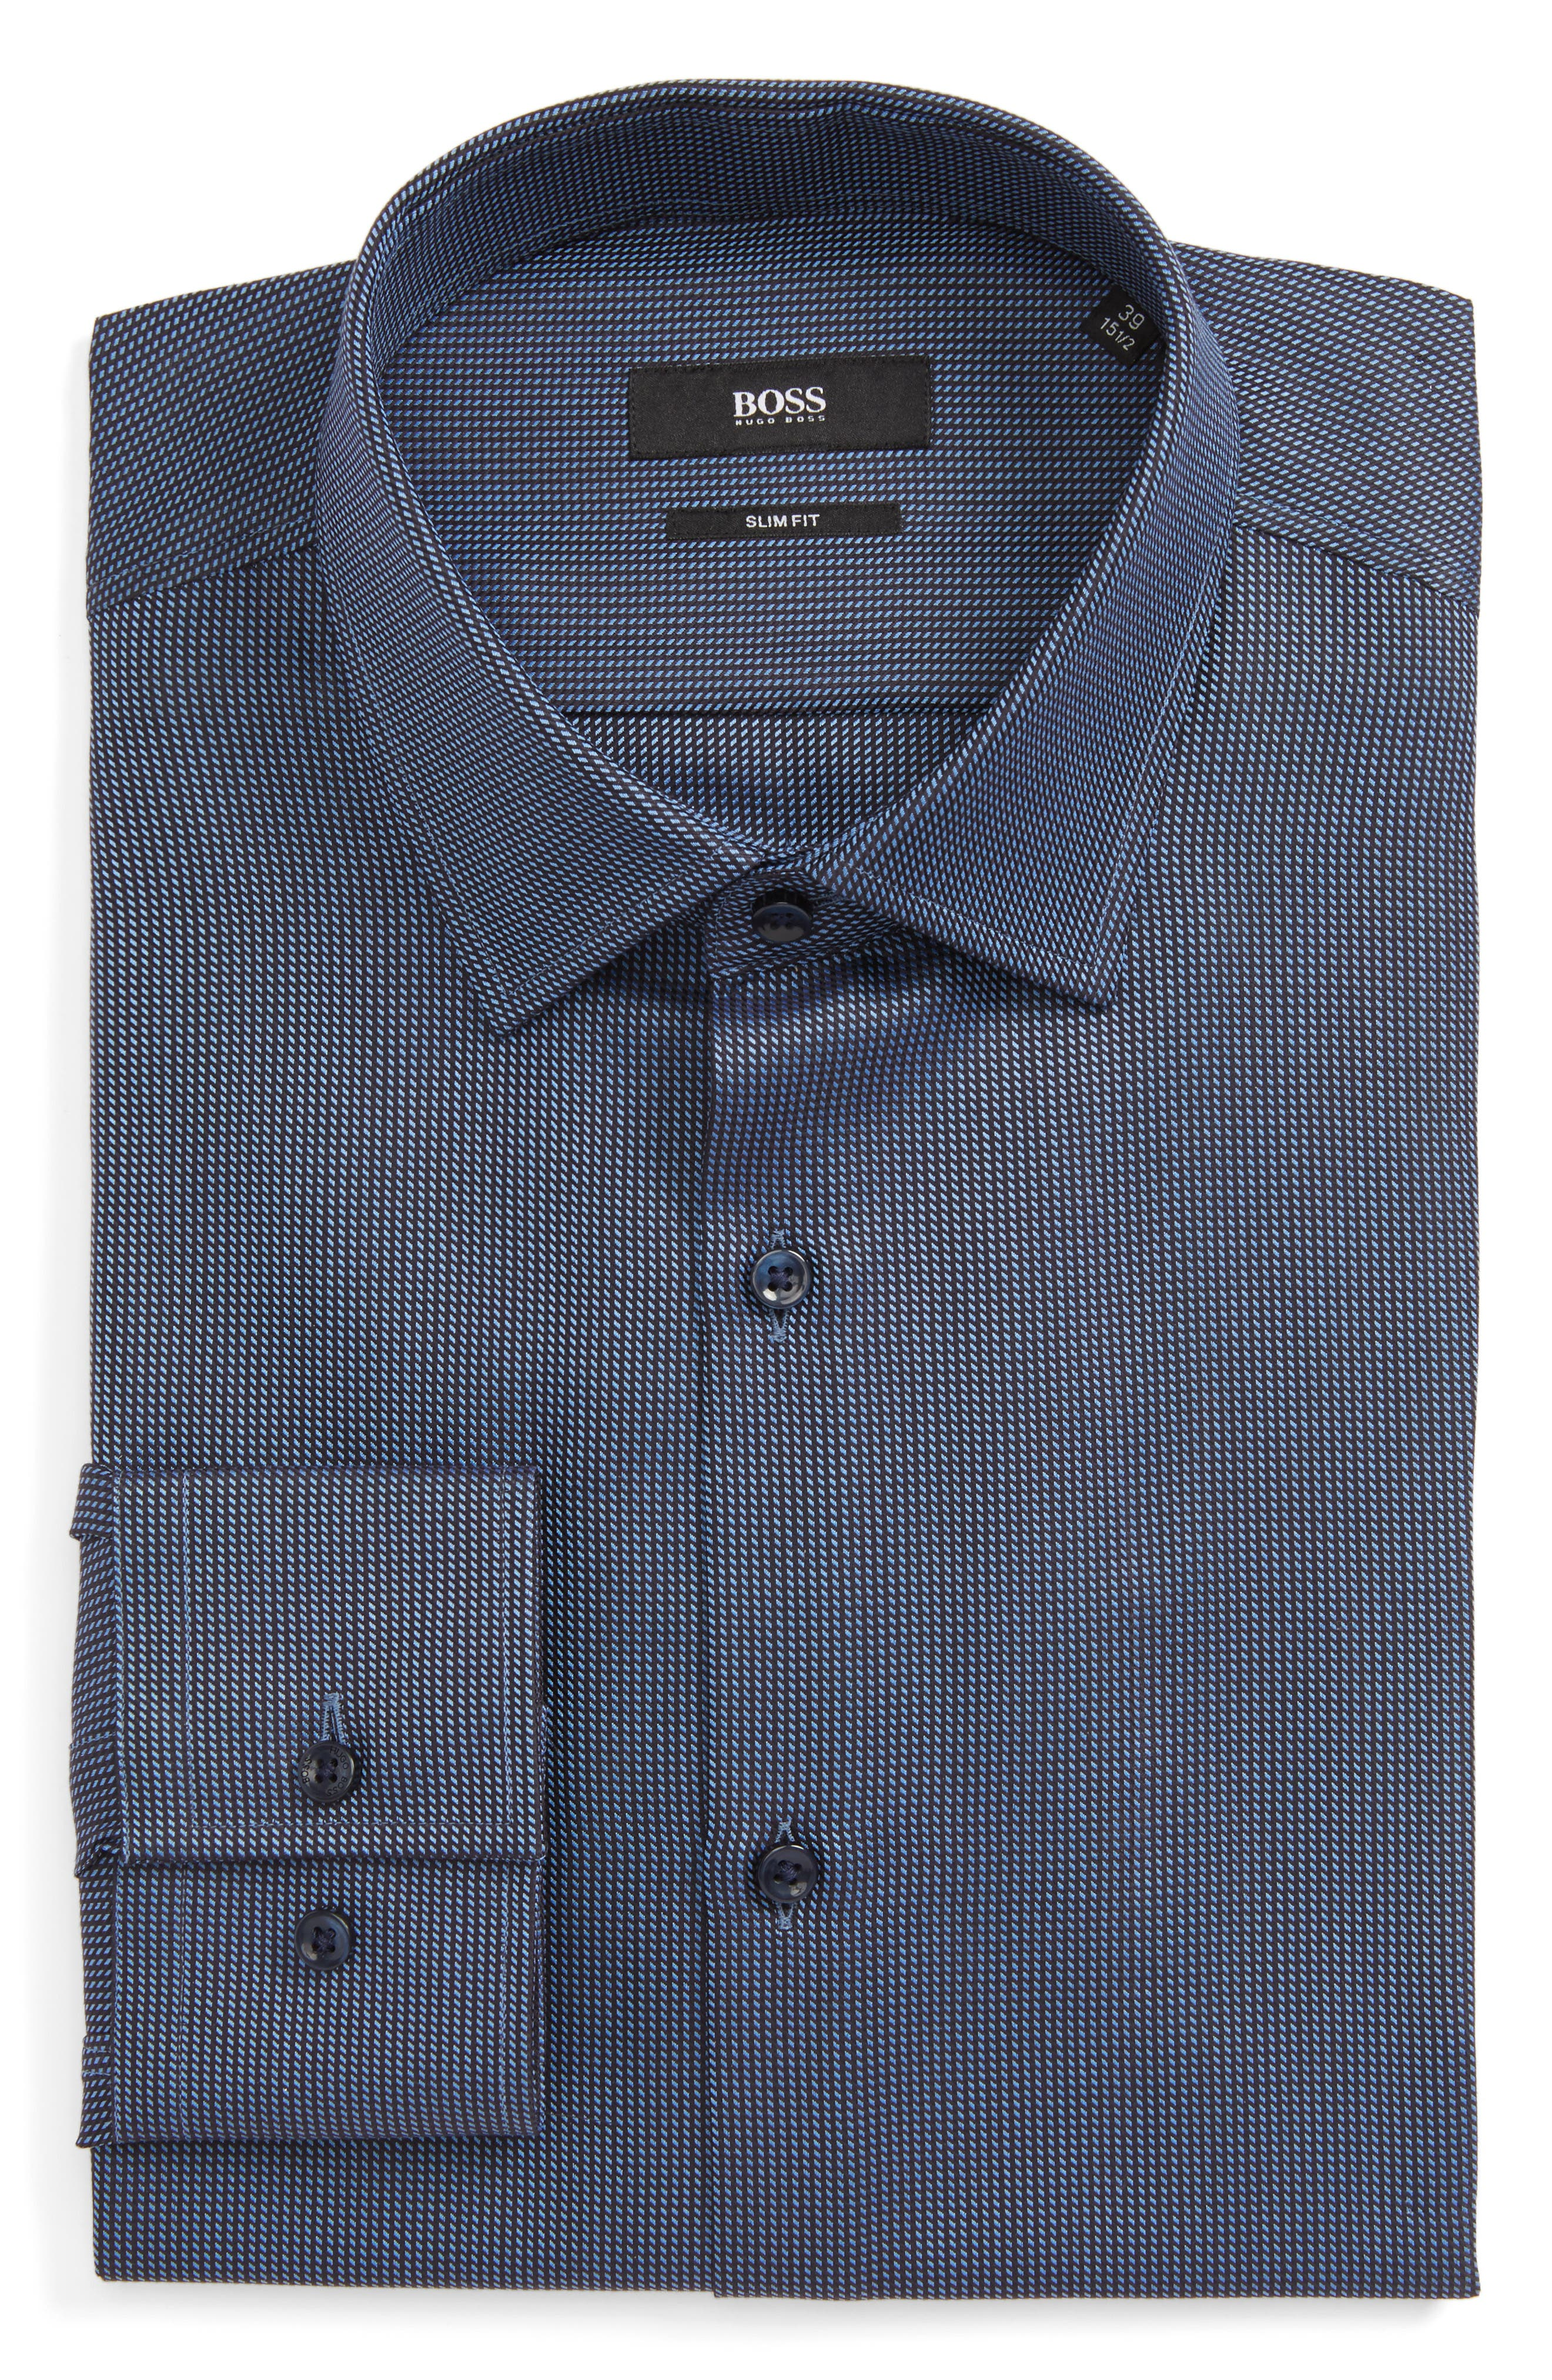 Alternate Image 1 Selected - BOSS Jenno Slim Fit Dress Shirt